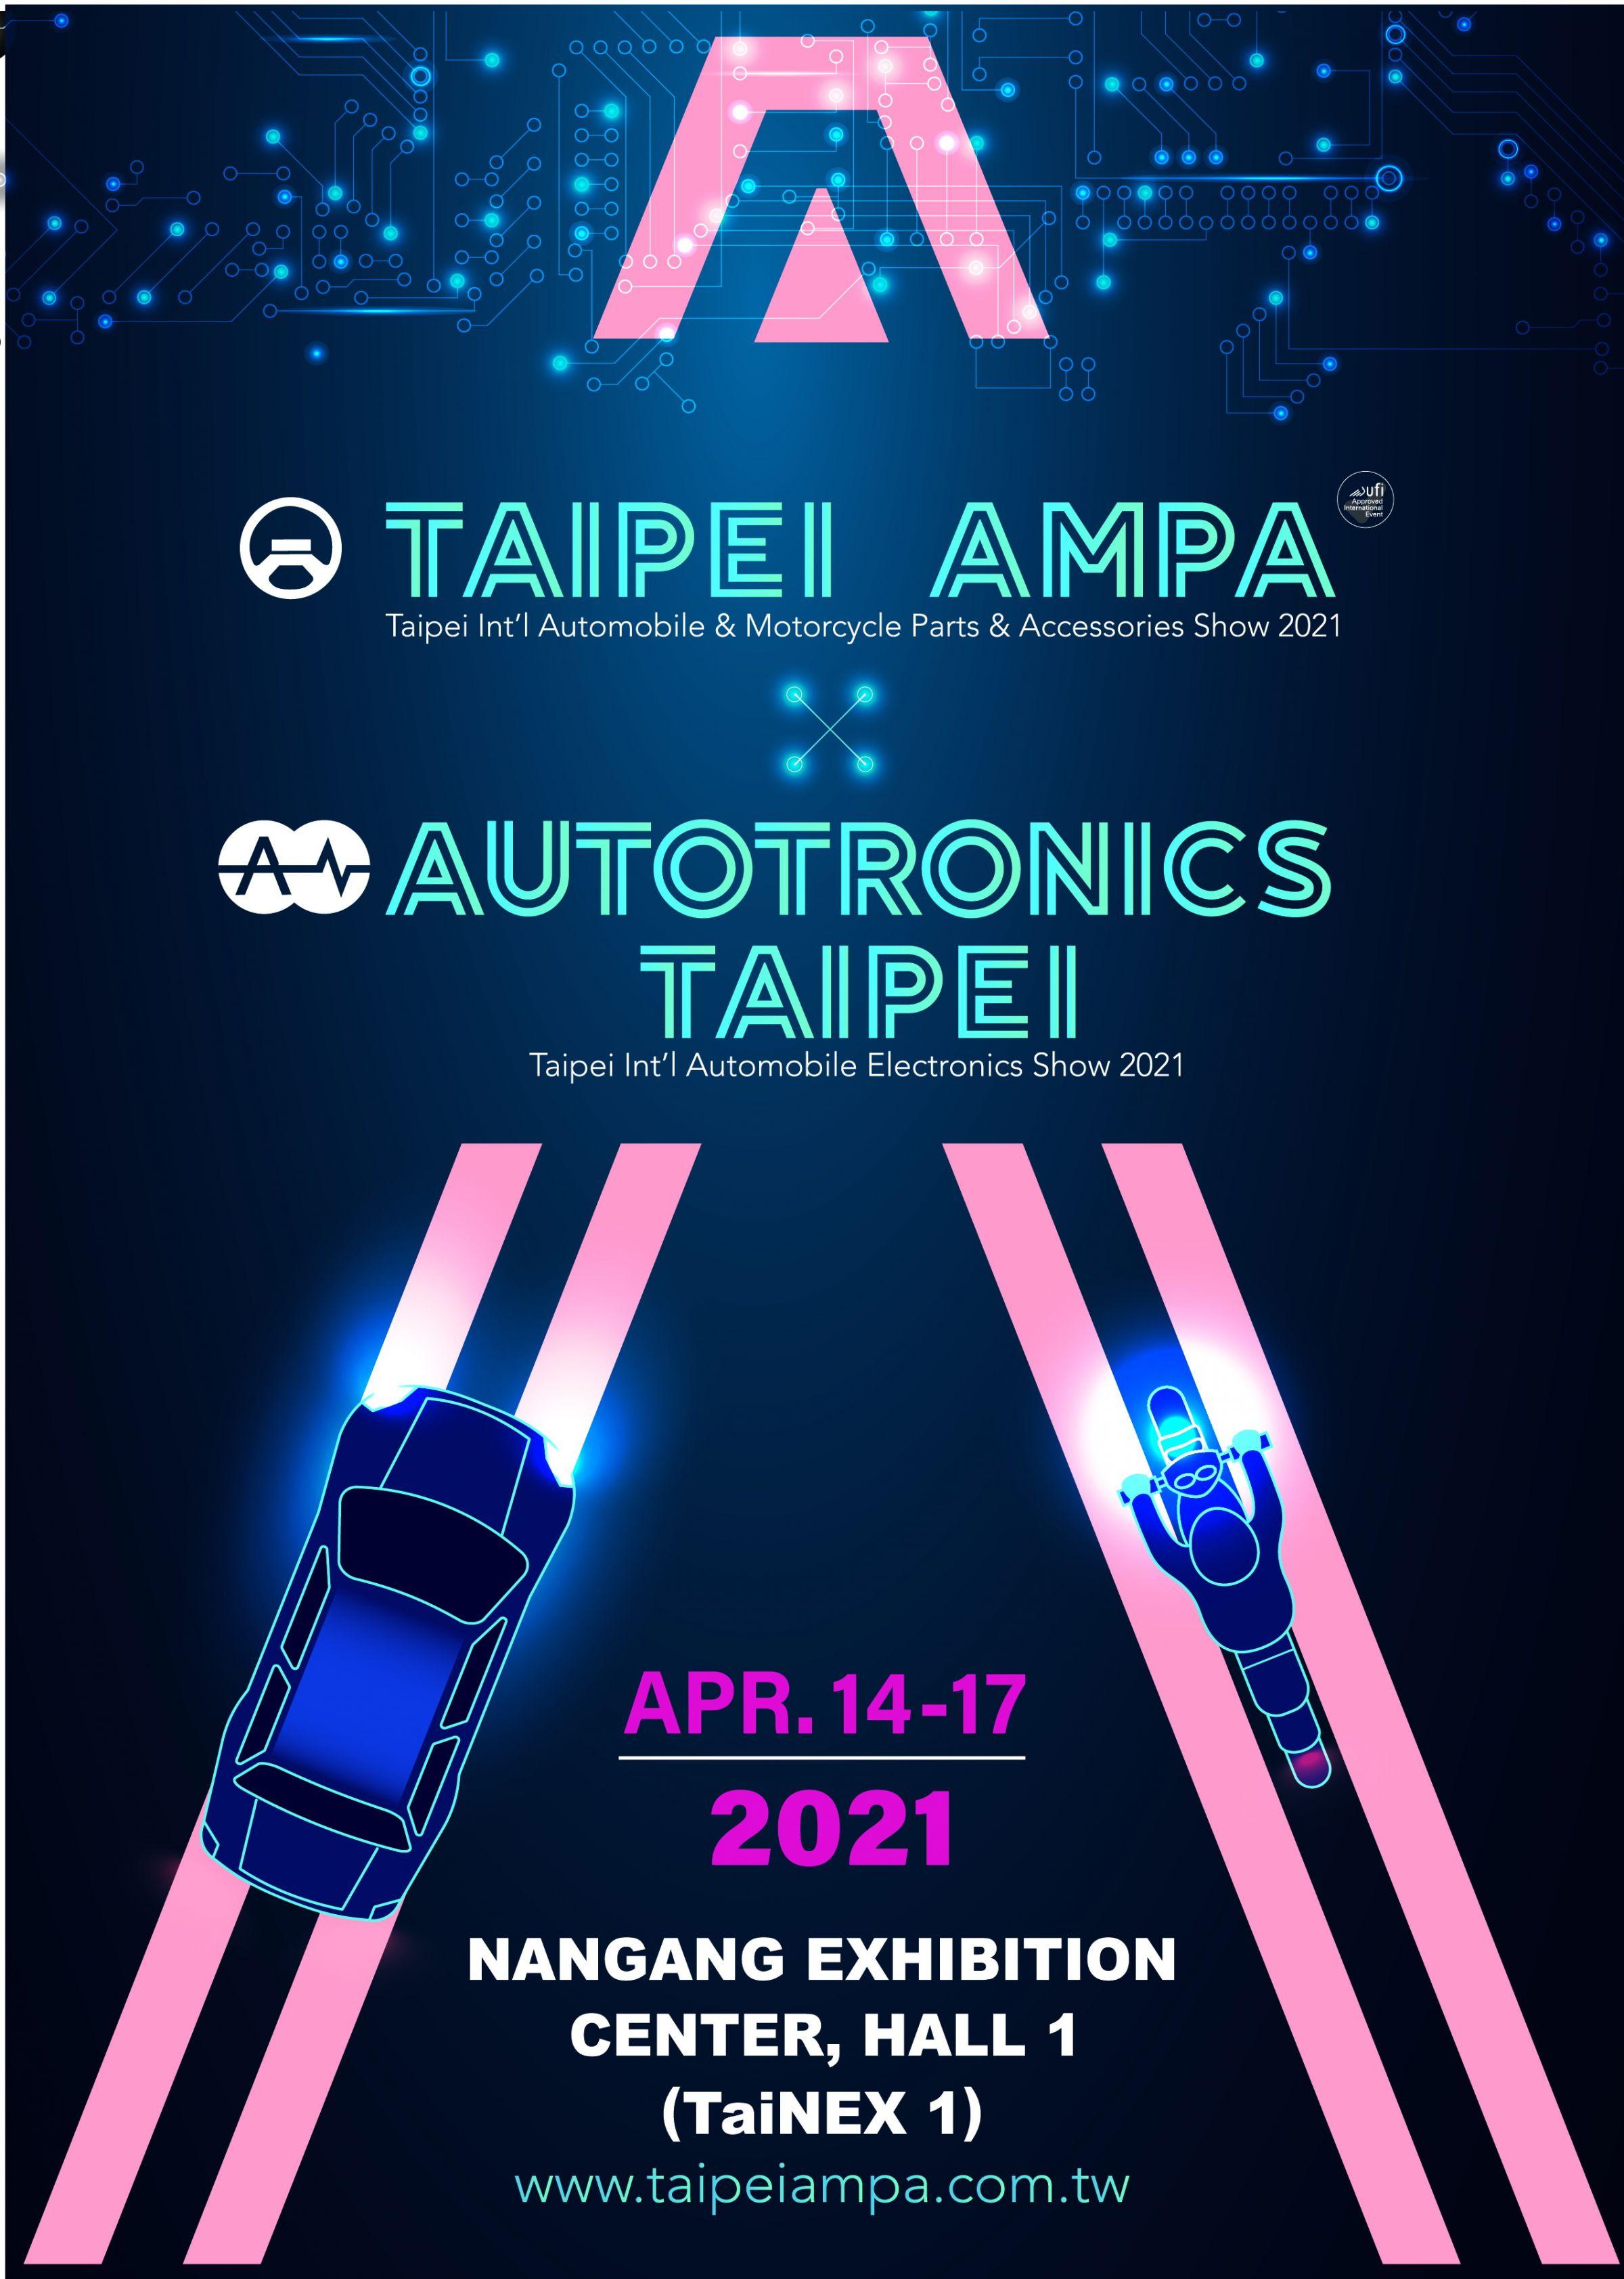 <a href=//www.taipeiampa.com.tw/en/index.html> 2021 Taipei AMPA / Autotronics Taipei</a>